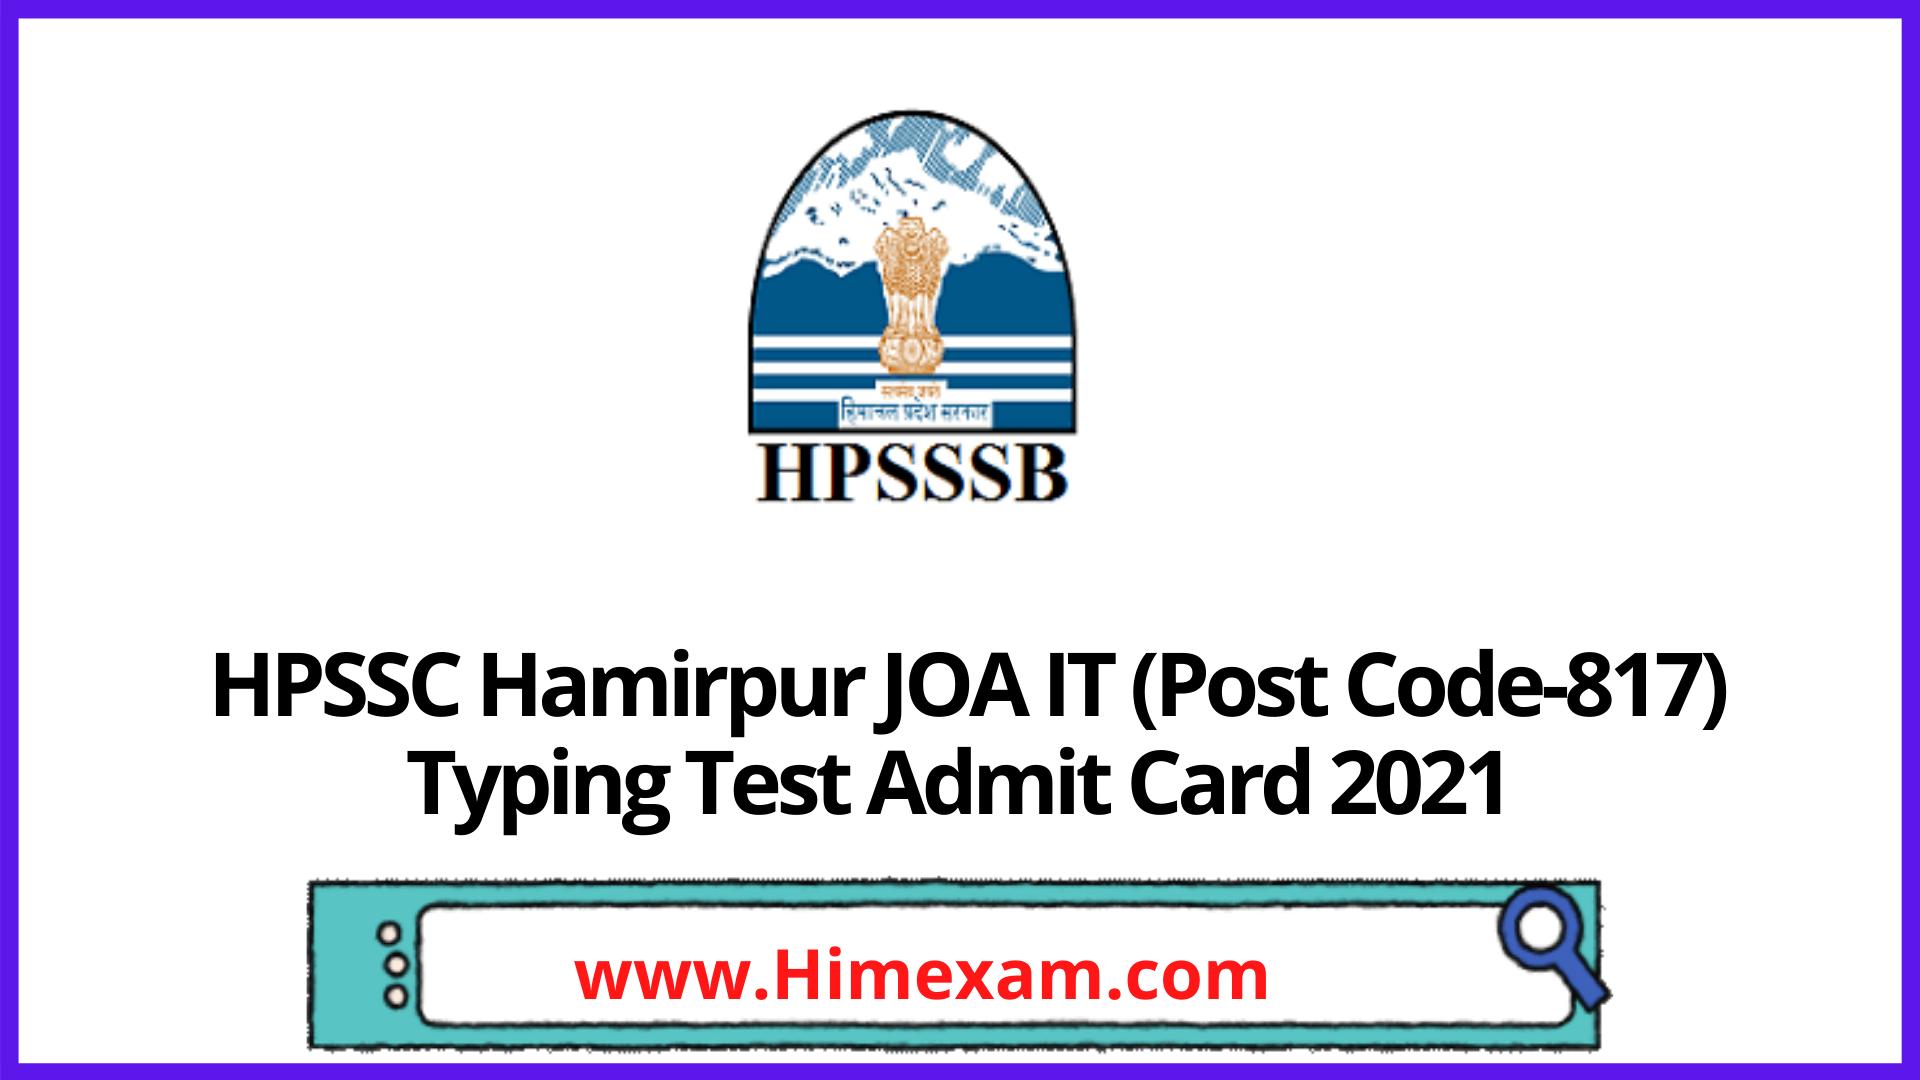 HPSSC Hamirpur JOA IT (Post Code-817) Typing Test Admit Card 2021